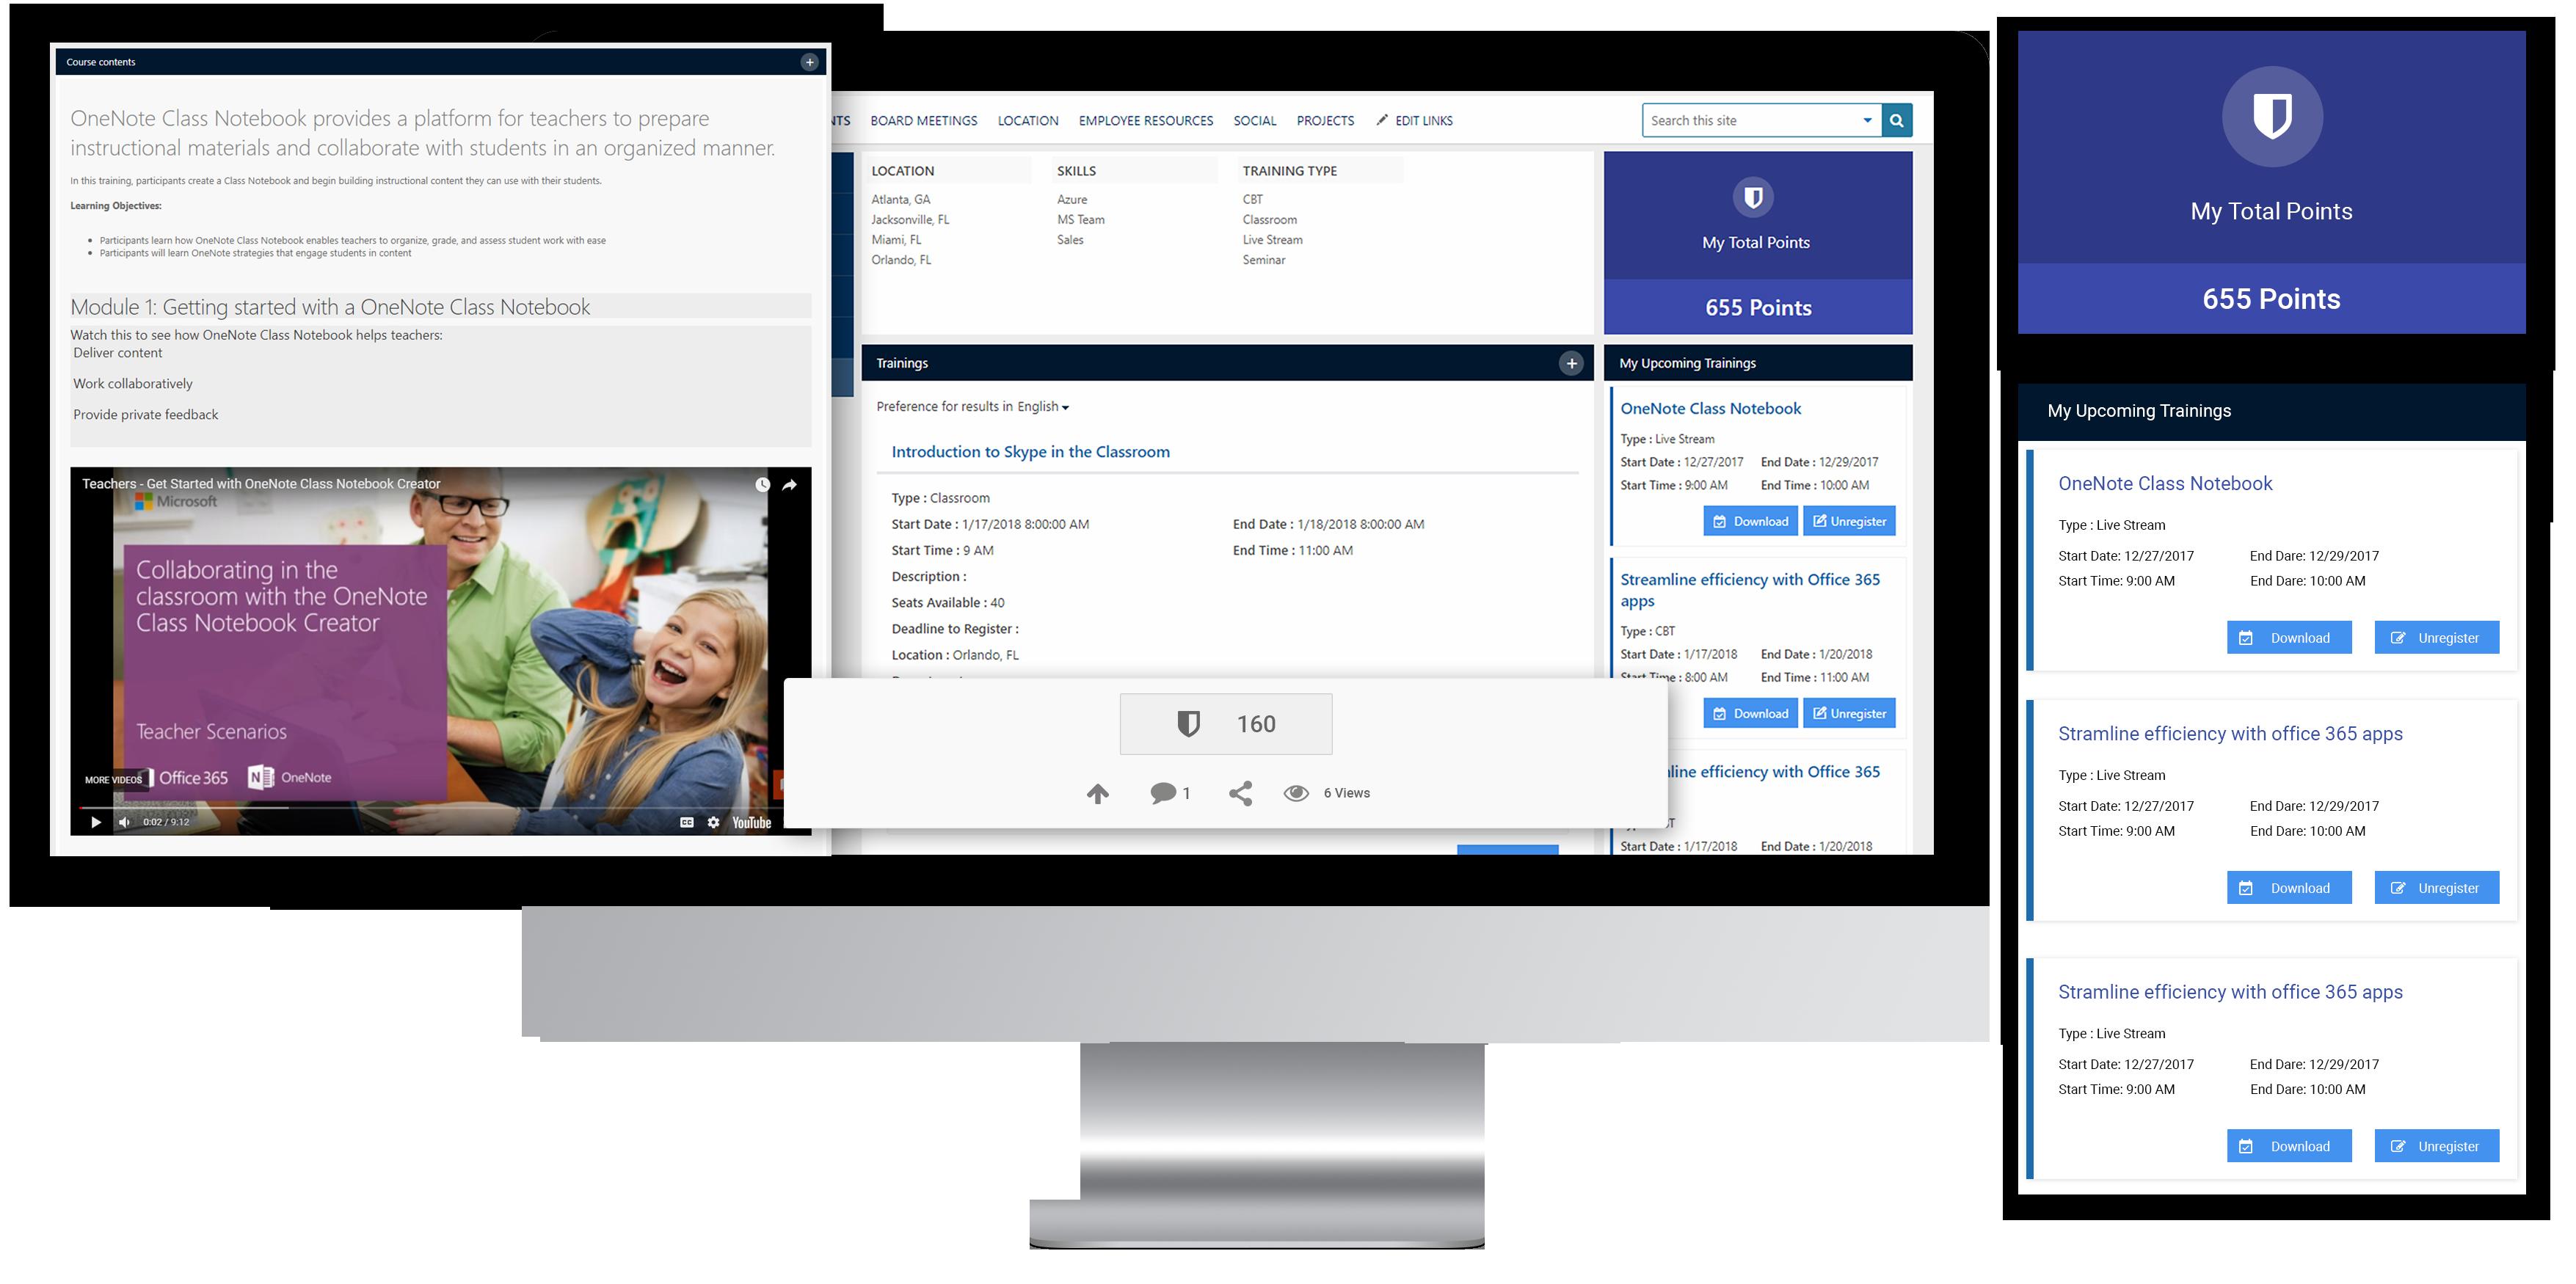 SharePoint-Training-Portal